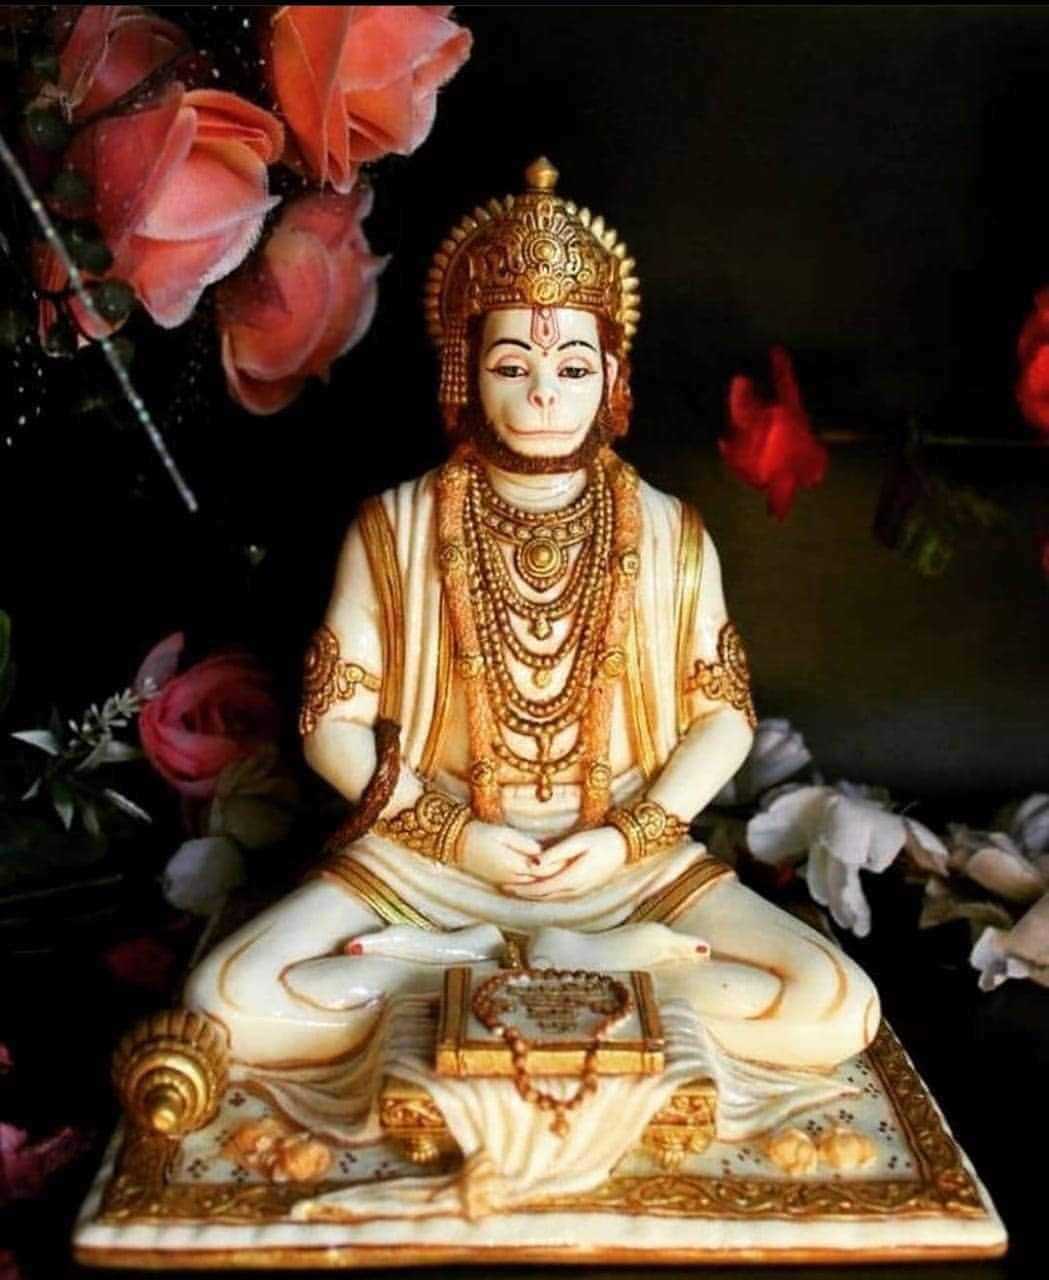 Lord Hanuman Instagram Images Wallpaper HD Free Download - Lord Hanuman Instagram Images Wallpaper HD Free Download